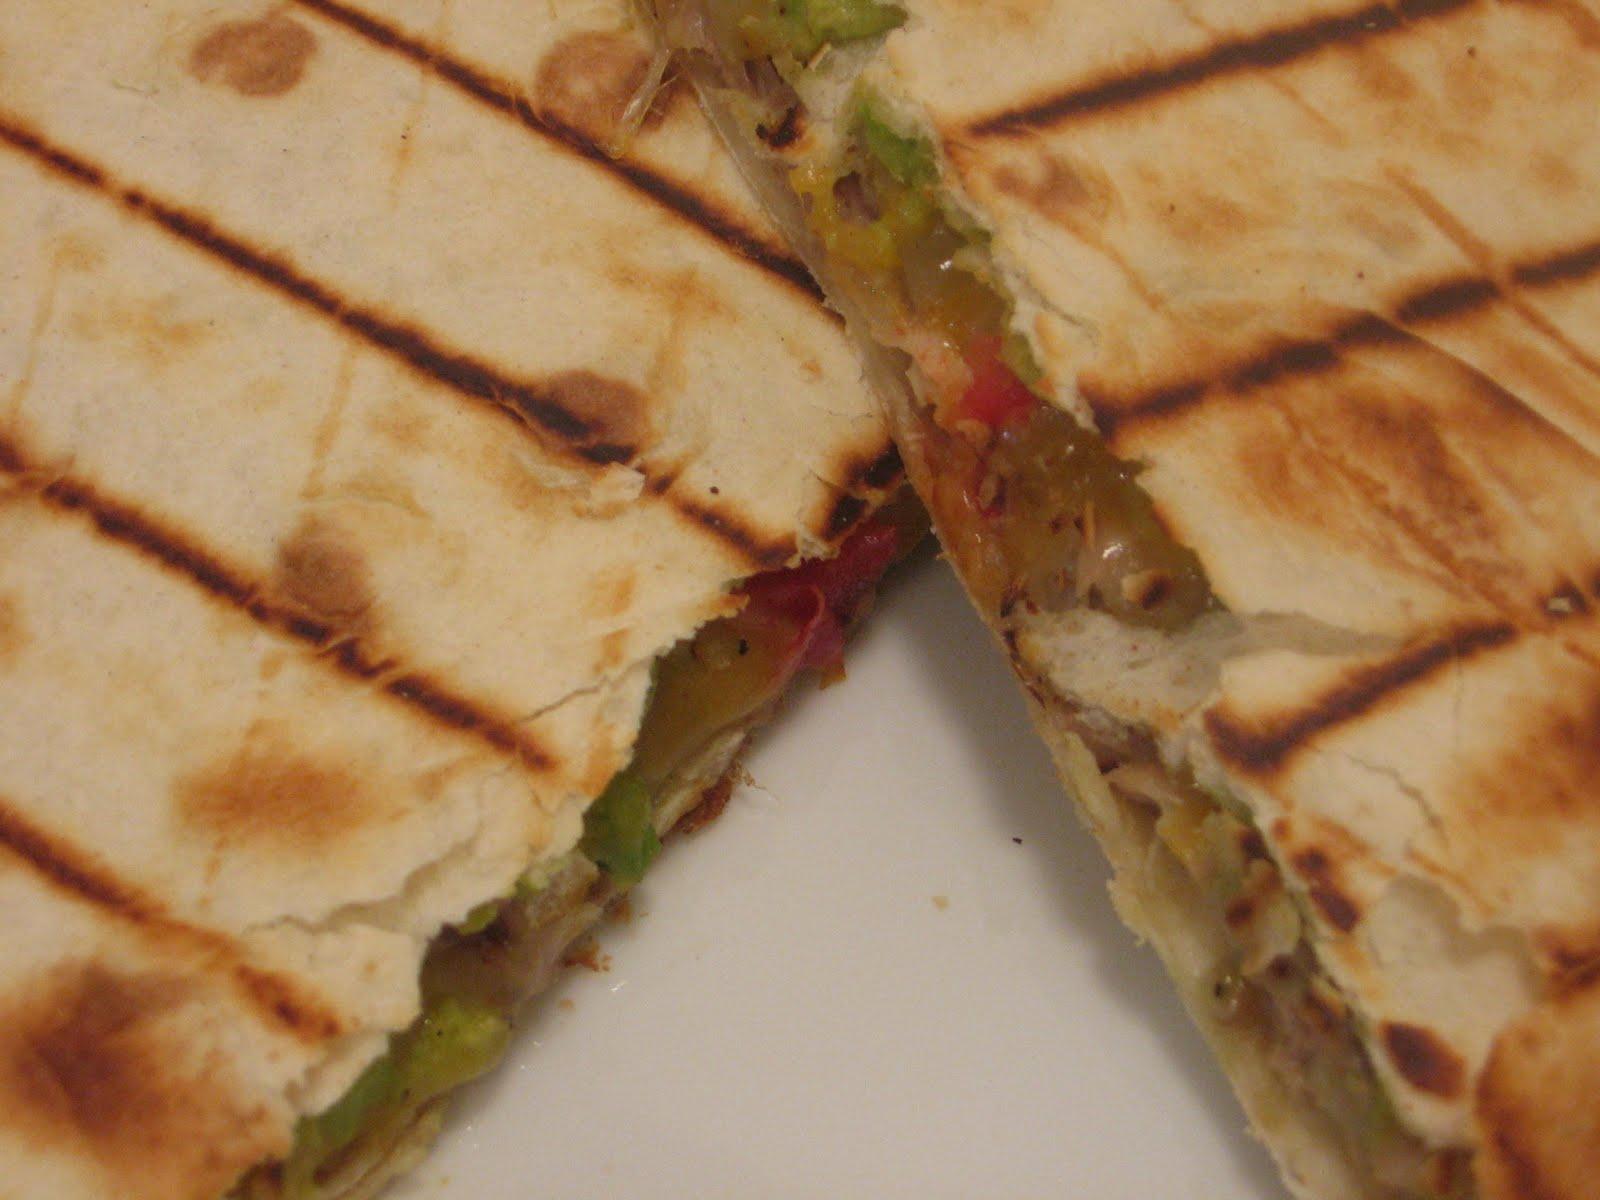 Jenn's Food Journey: Pulled Pork Quesadillas